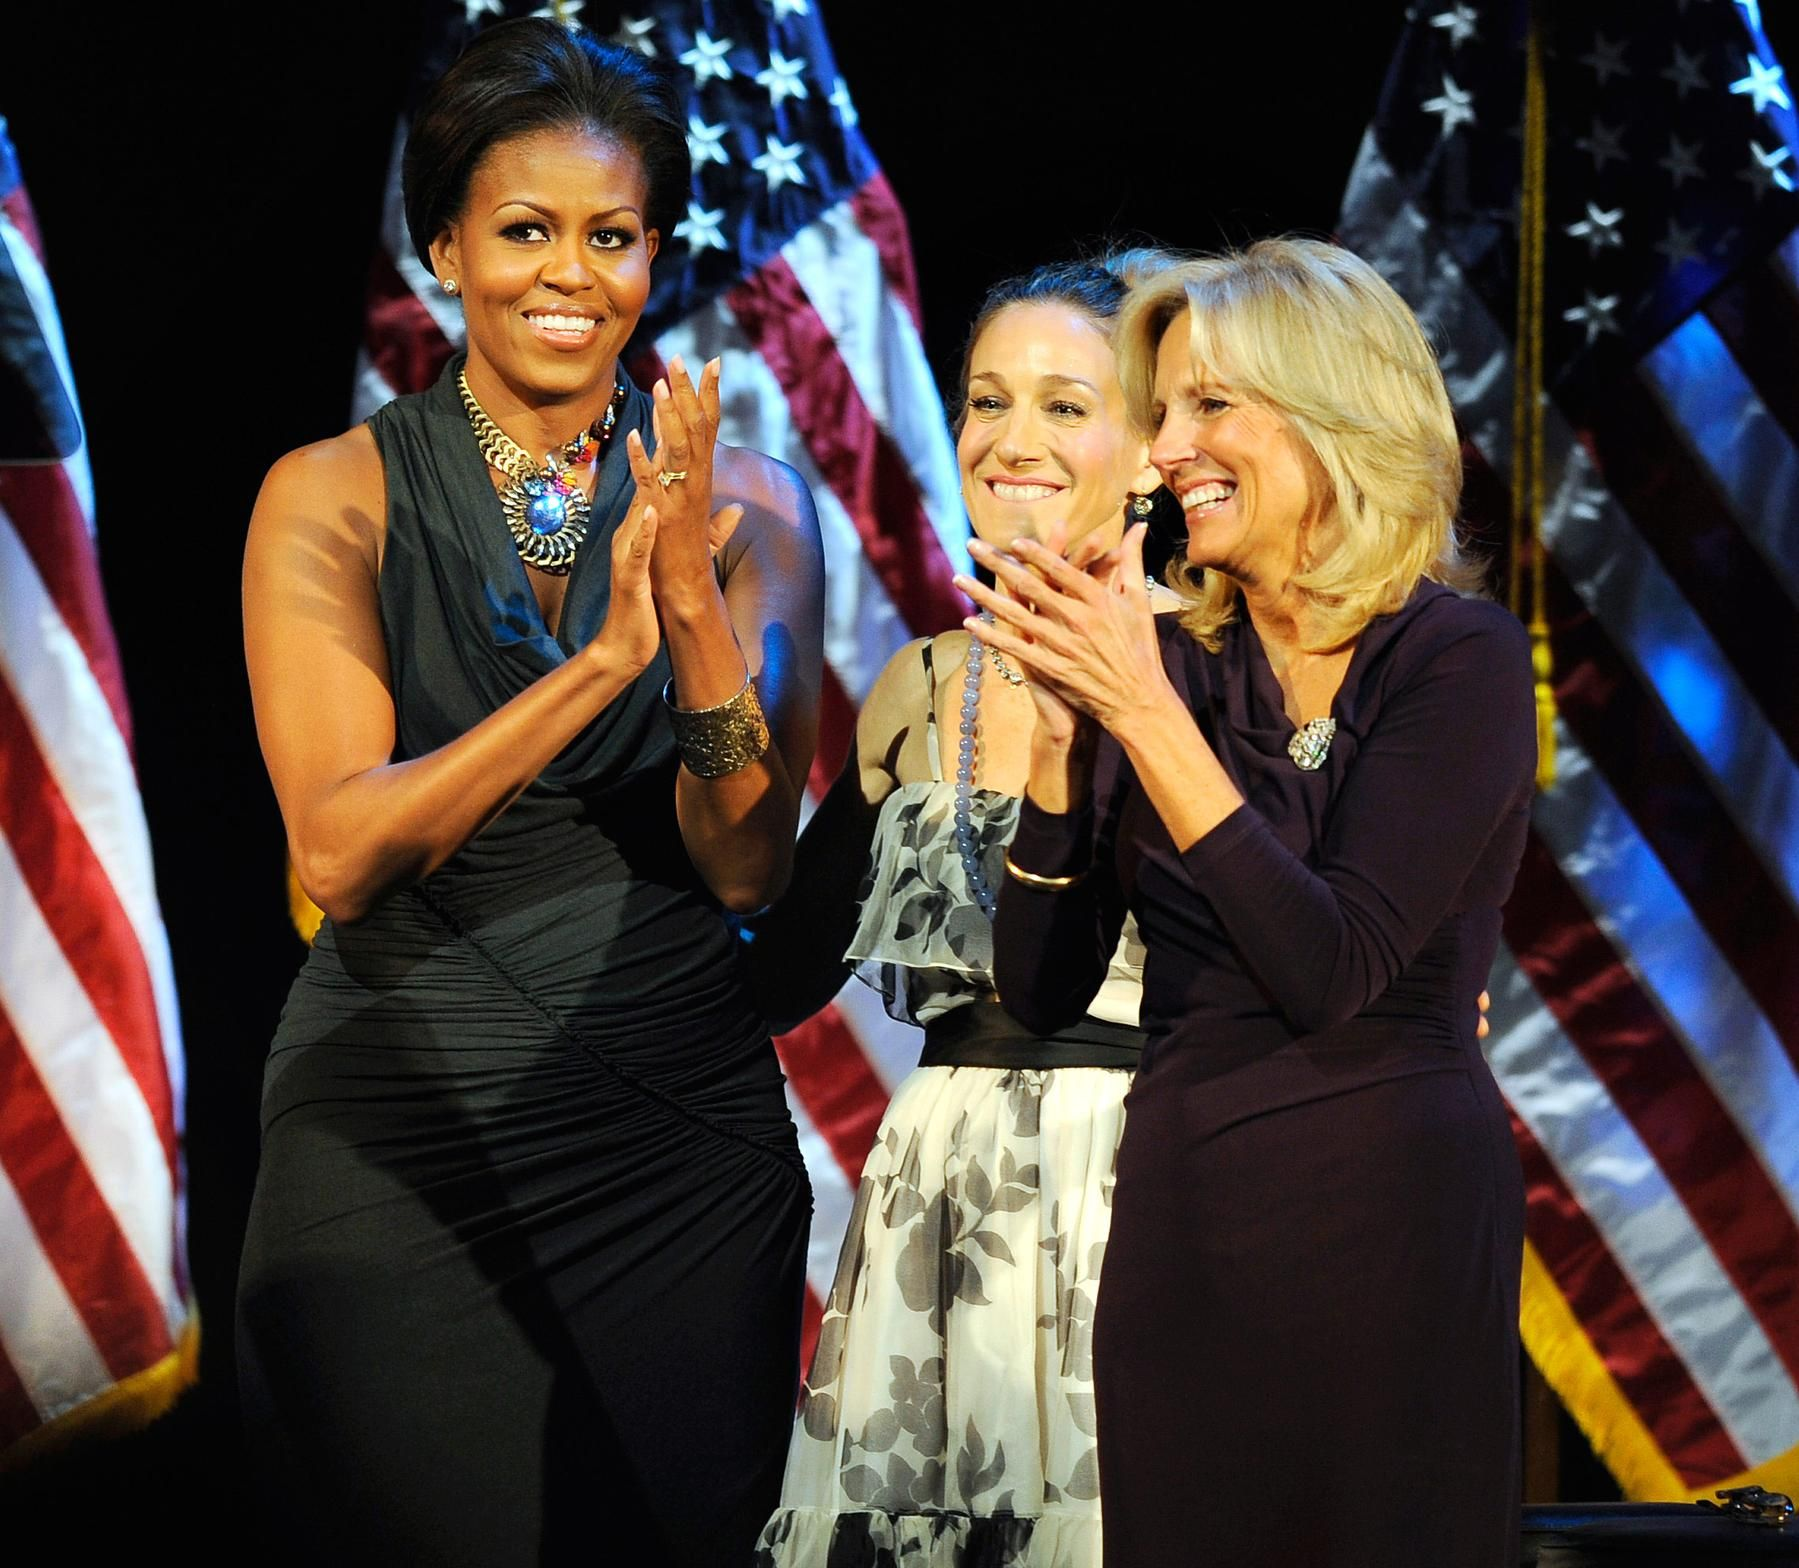 Jessica sarah parker obama fundraiser video new photo